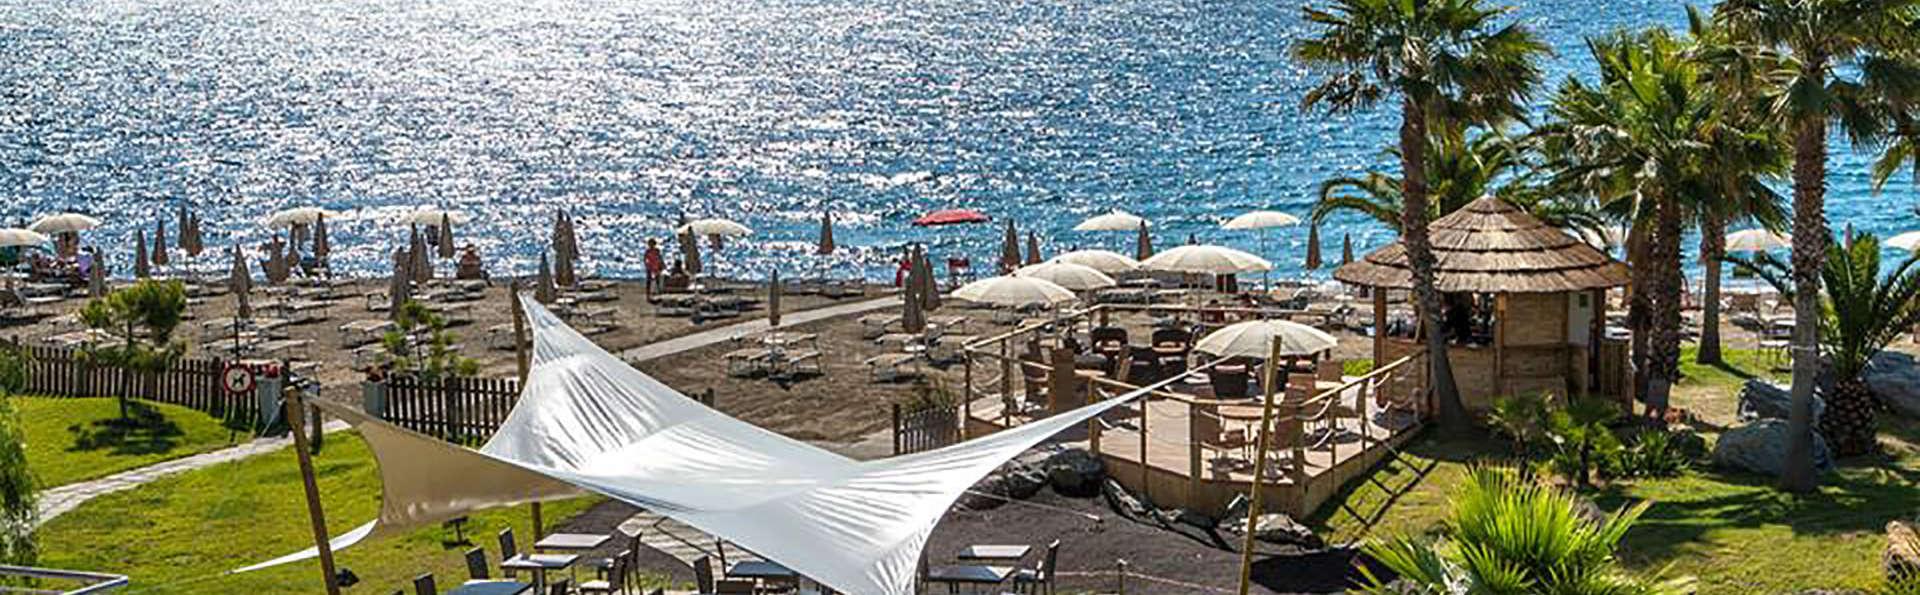 Aregai Marina Hotel & Residence - edit_spiaggia.jpg